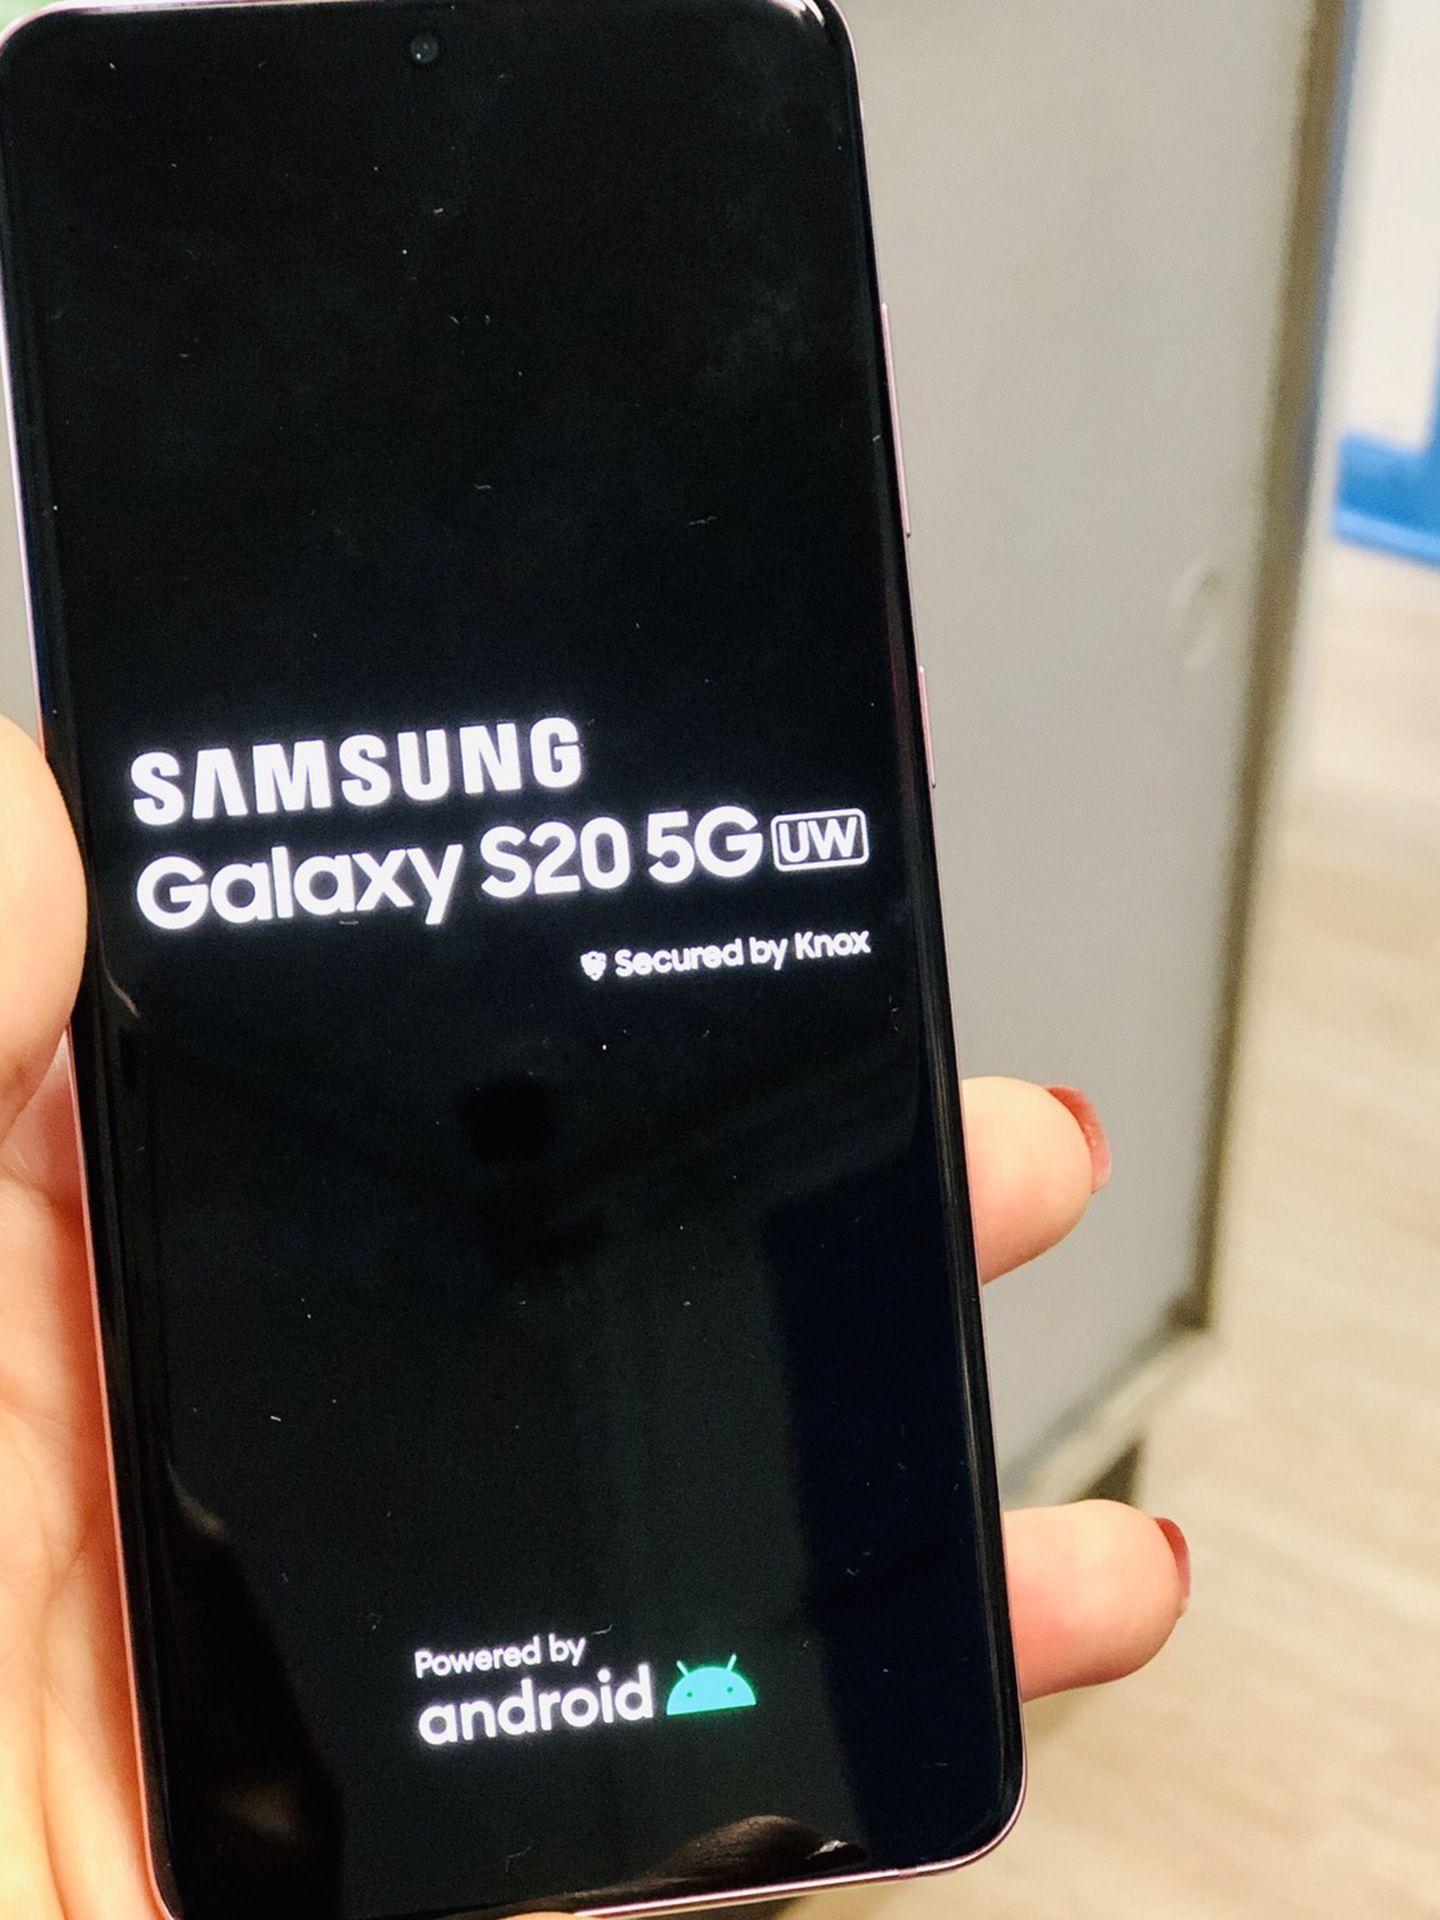 Samsung Galaxy s20 5g, 128 gb unlocked, Excellent condition